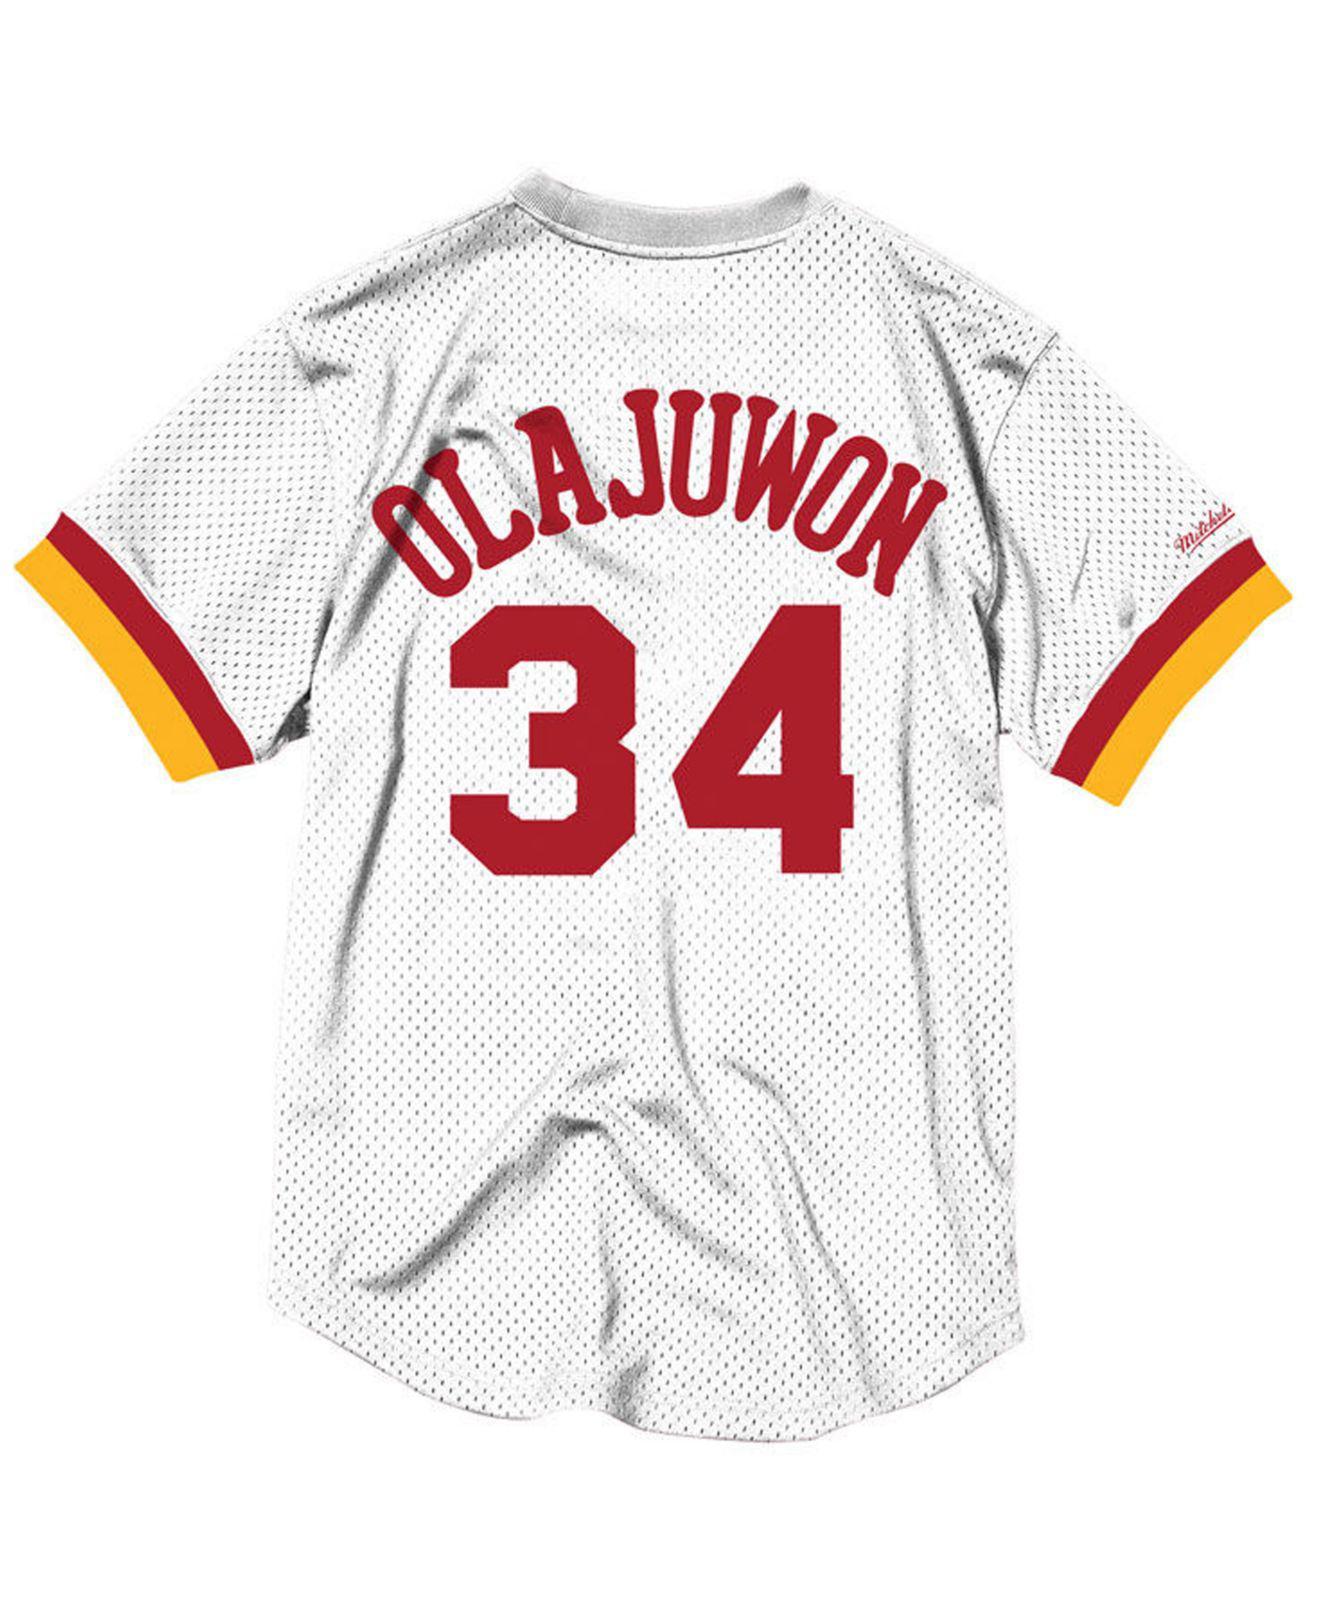 buy online 324c1 86a0f get vintage hakeem olajuwon houston rockets gold jersey ...